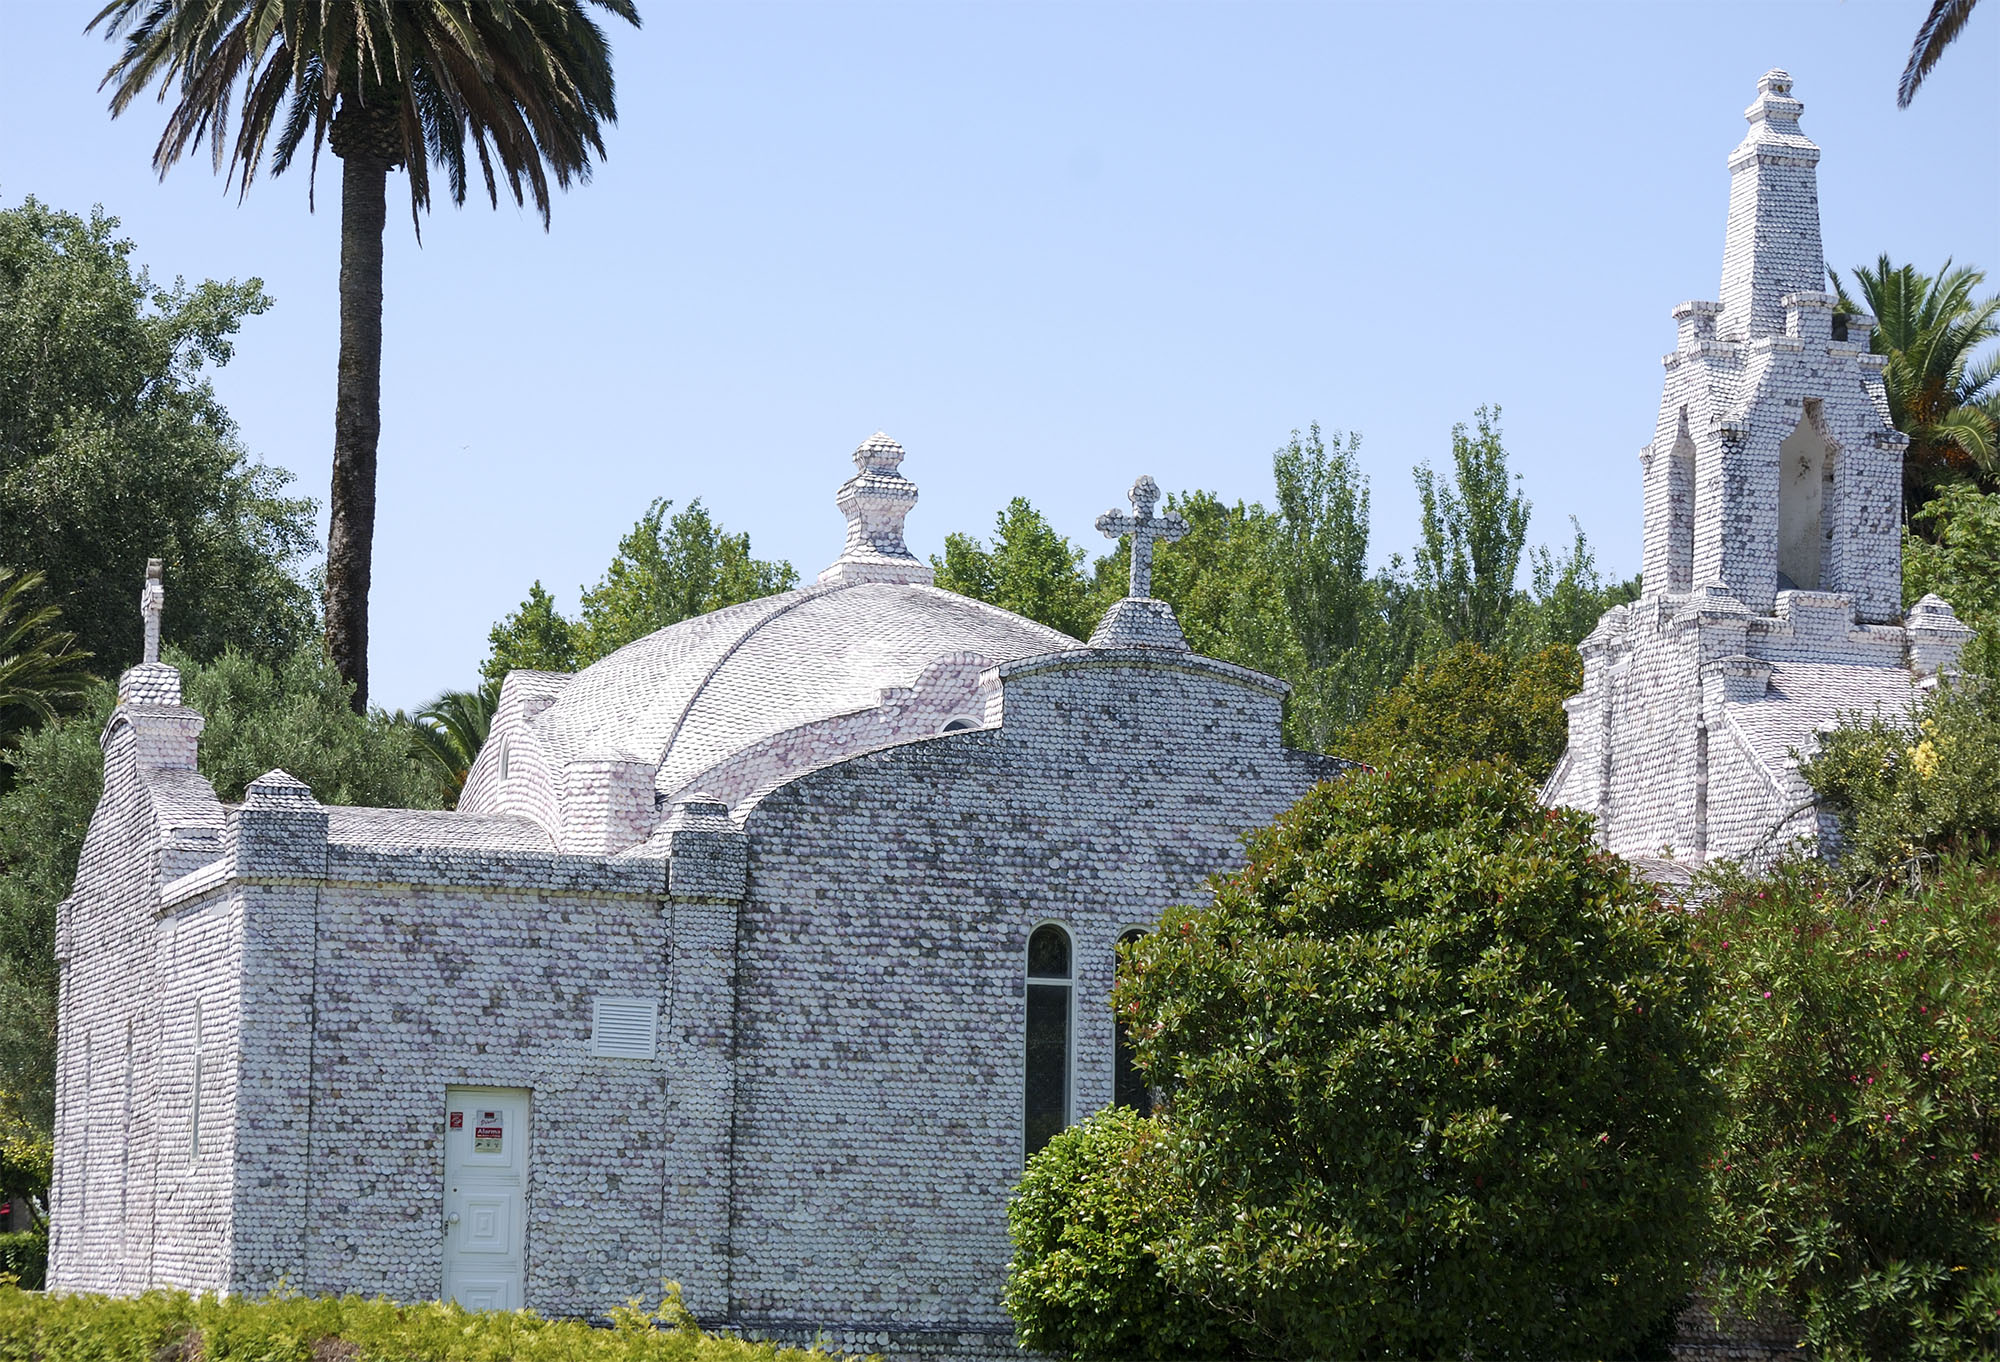 La Toja church